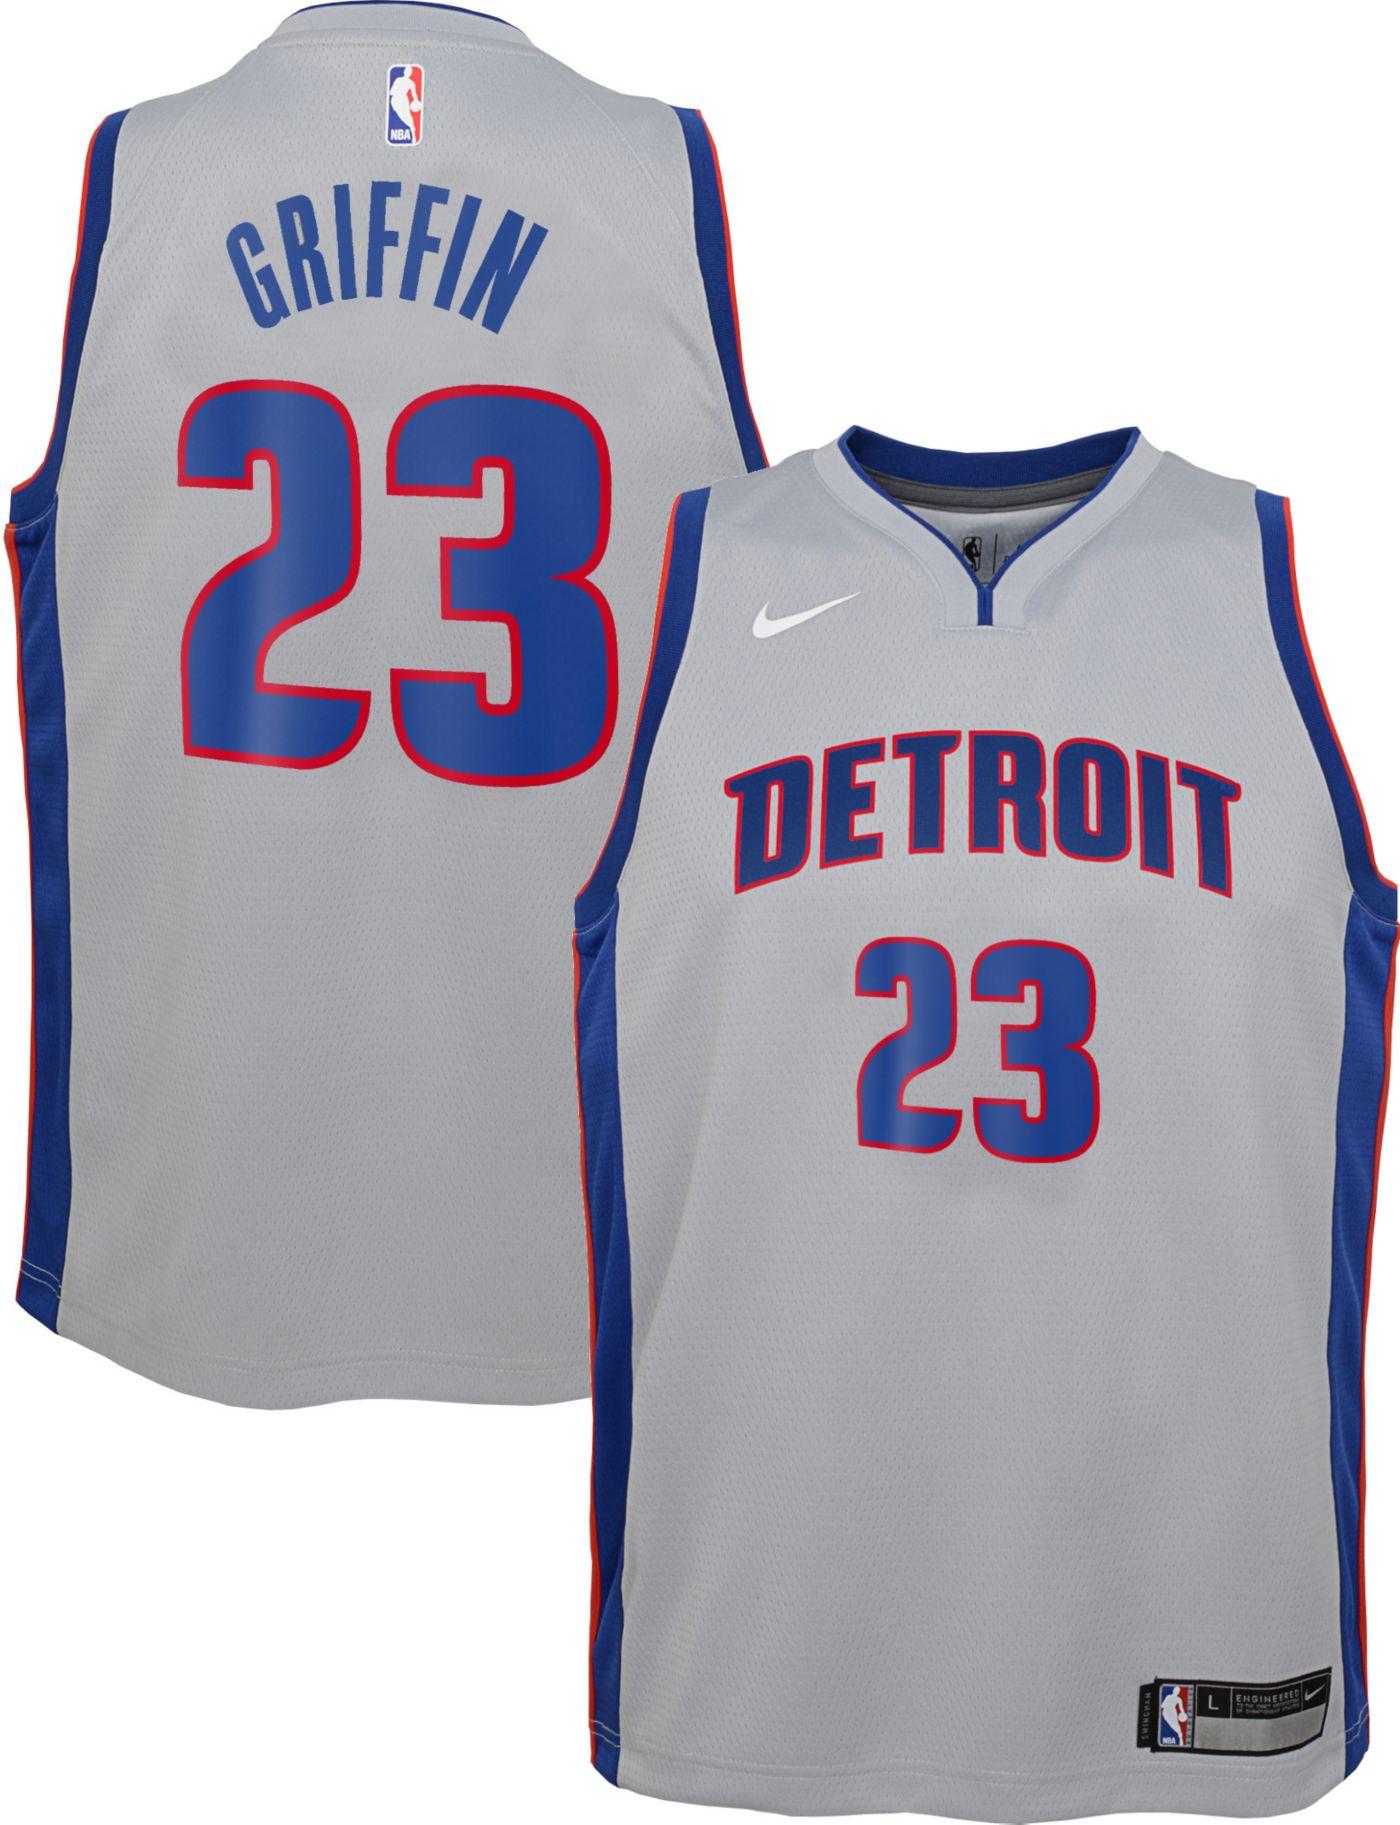 Nike Youth Detroit Pistons Blake Griffin #23 Grey Dri-FIT Statement Swingman Jersey